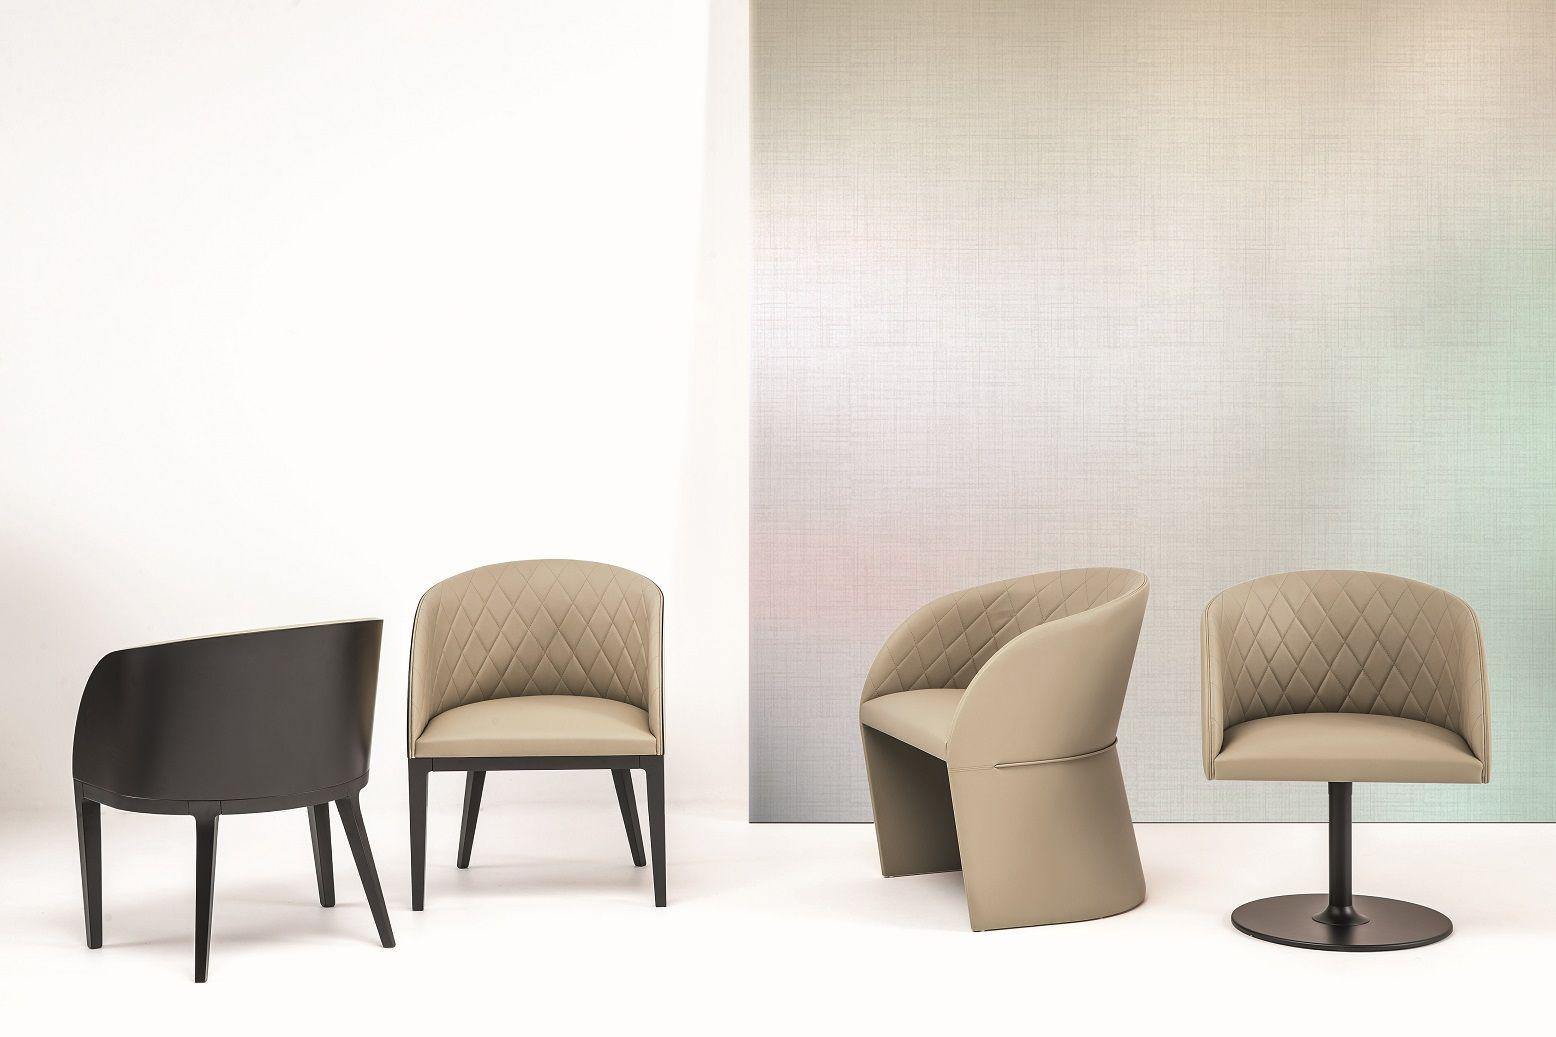 Costantini sedie ~ Chairs: bross hug casarredo chairs pinterest hug